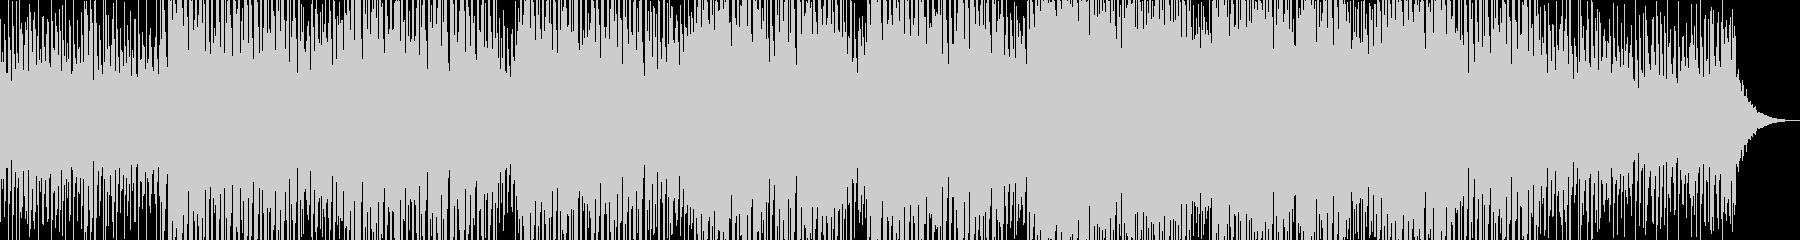 U2テイストのダンスミュージックの未再生の波形